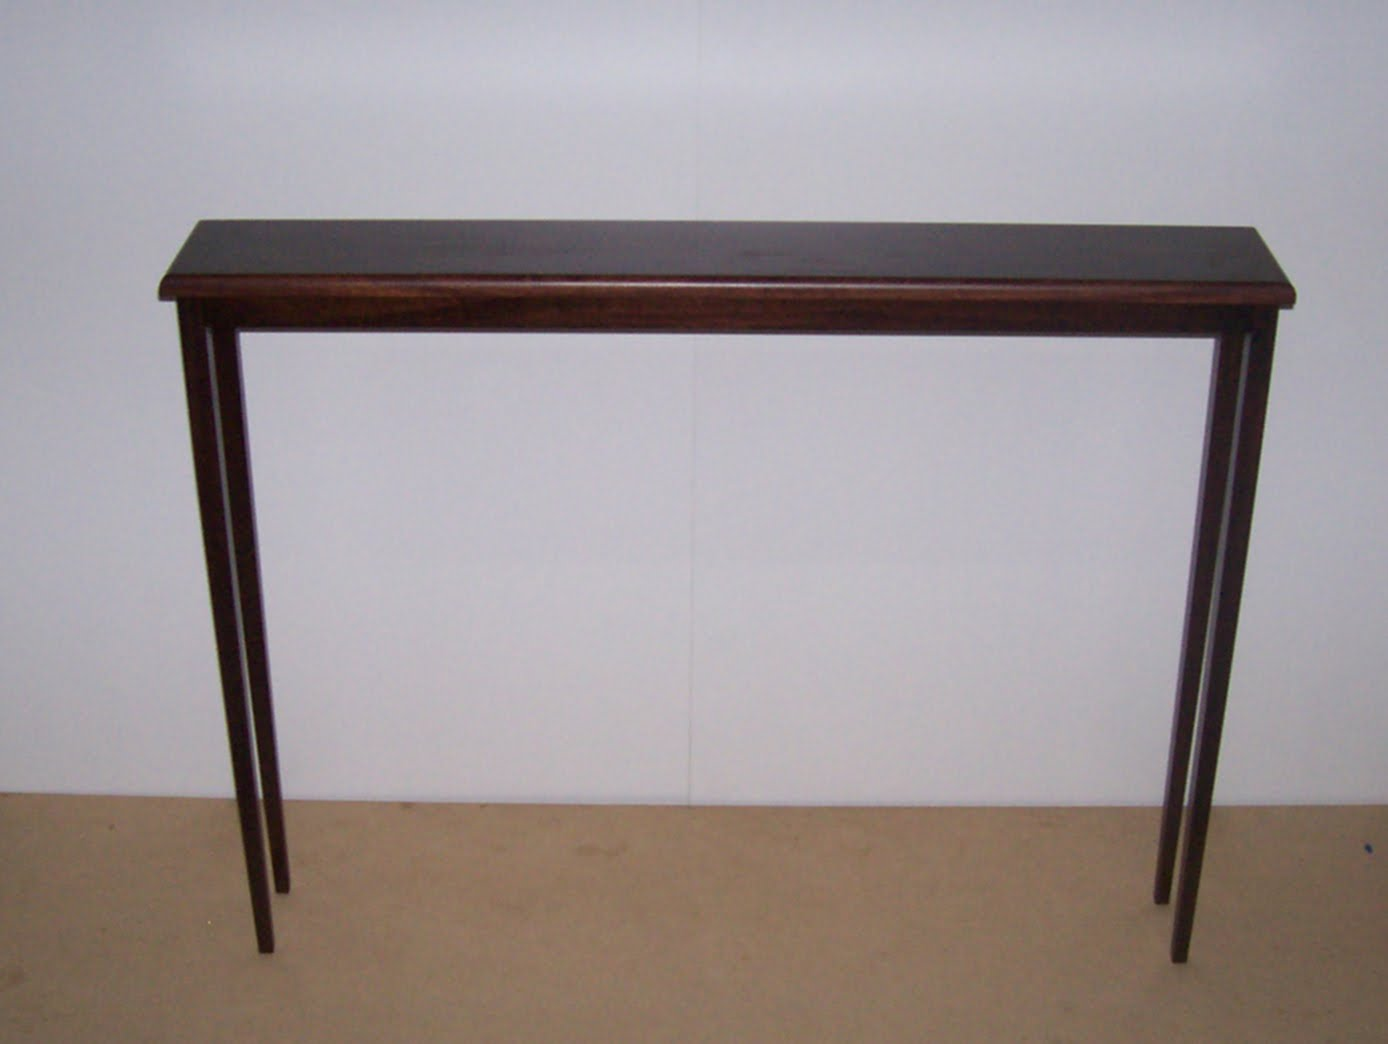 Guti rrez muebles dise o peque os muebles mesa olivia for Muebles torres y gutierrez